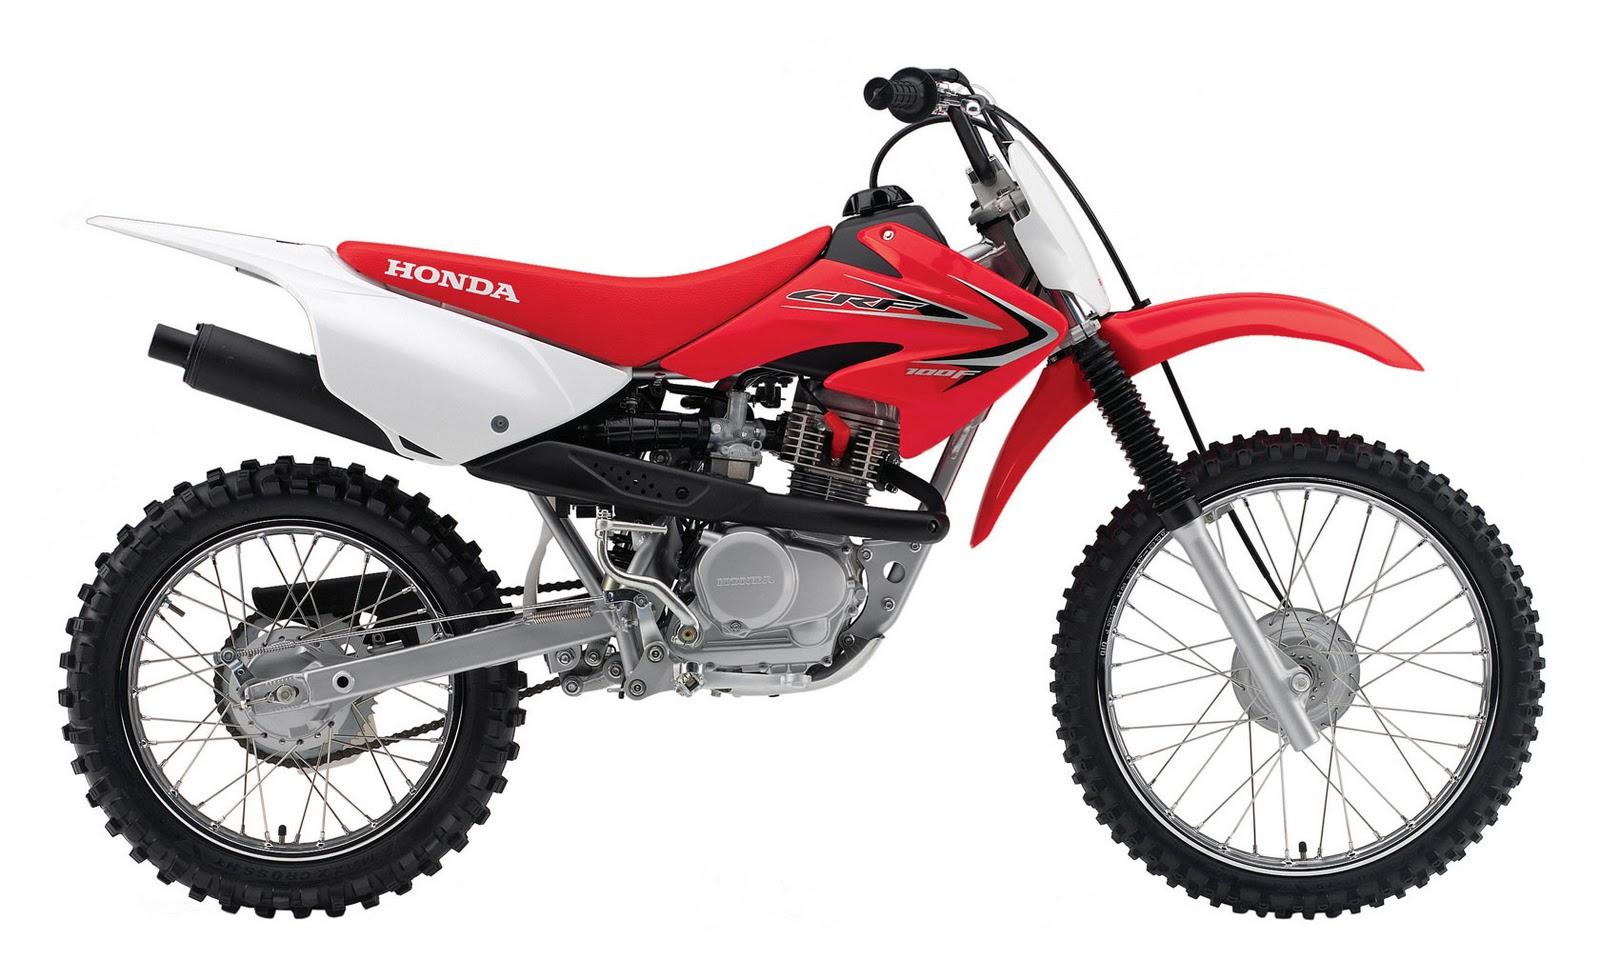 Honda Motorcycle Pictures: Honda CRF 100 F - 2011